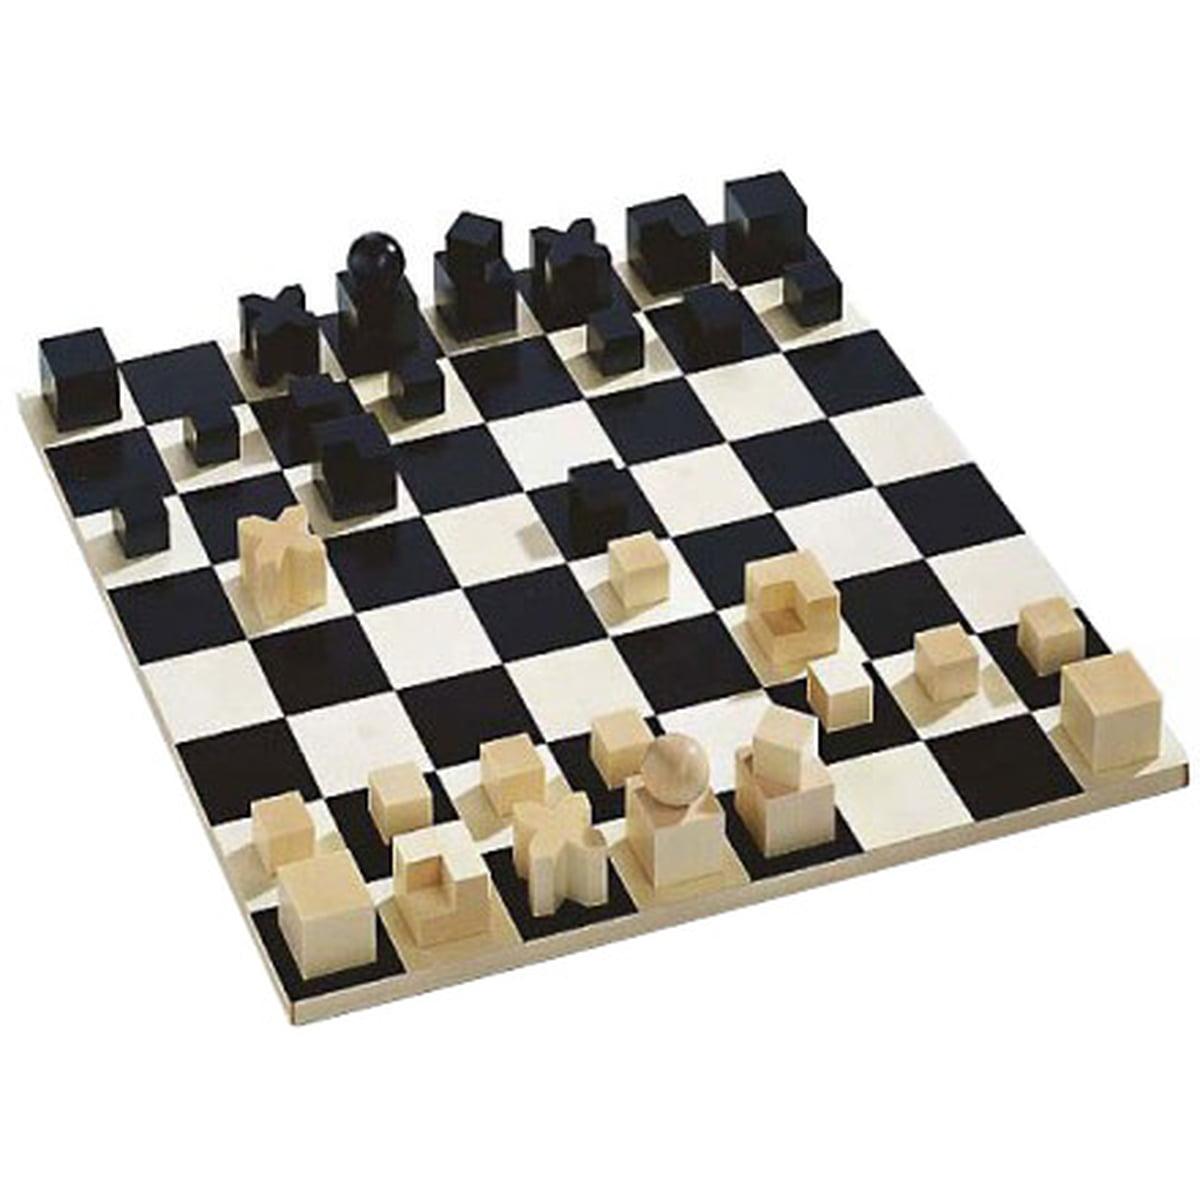 bauhaus chess set naef spiele shop. Black Bedroom Furniture Sets. Home Design Ideas